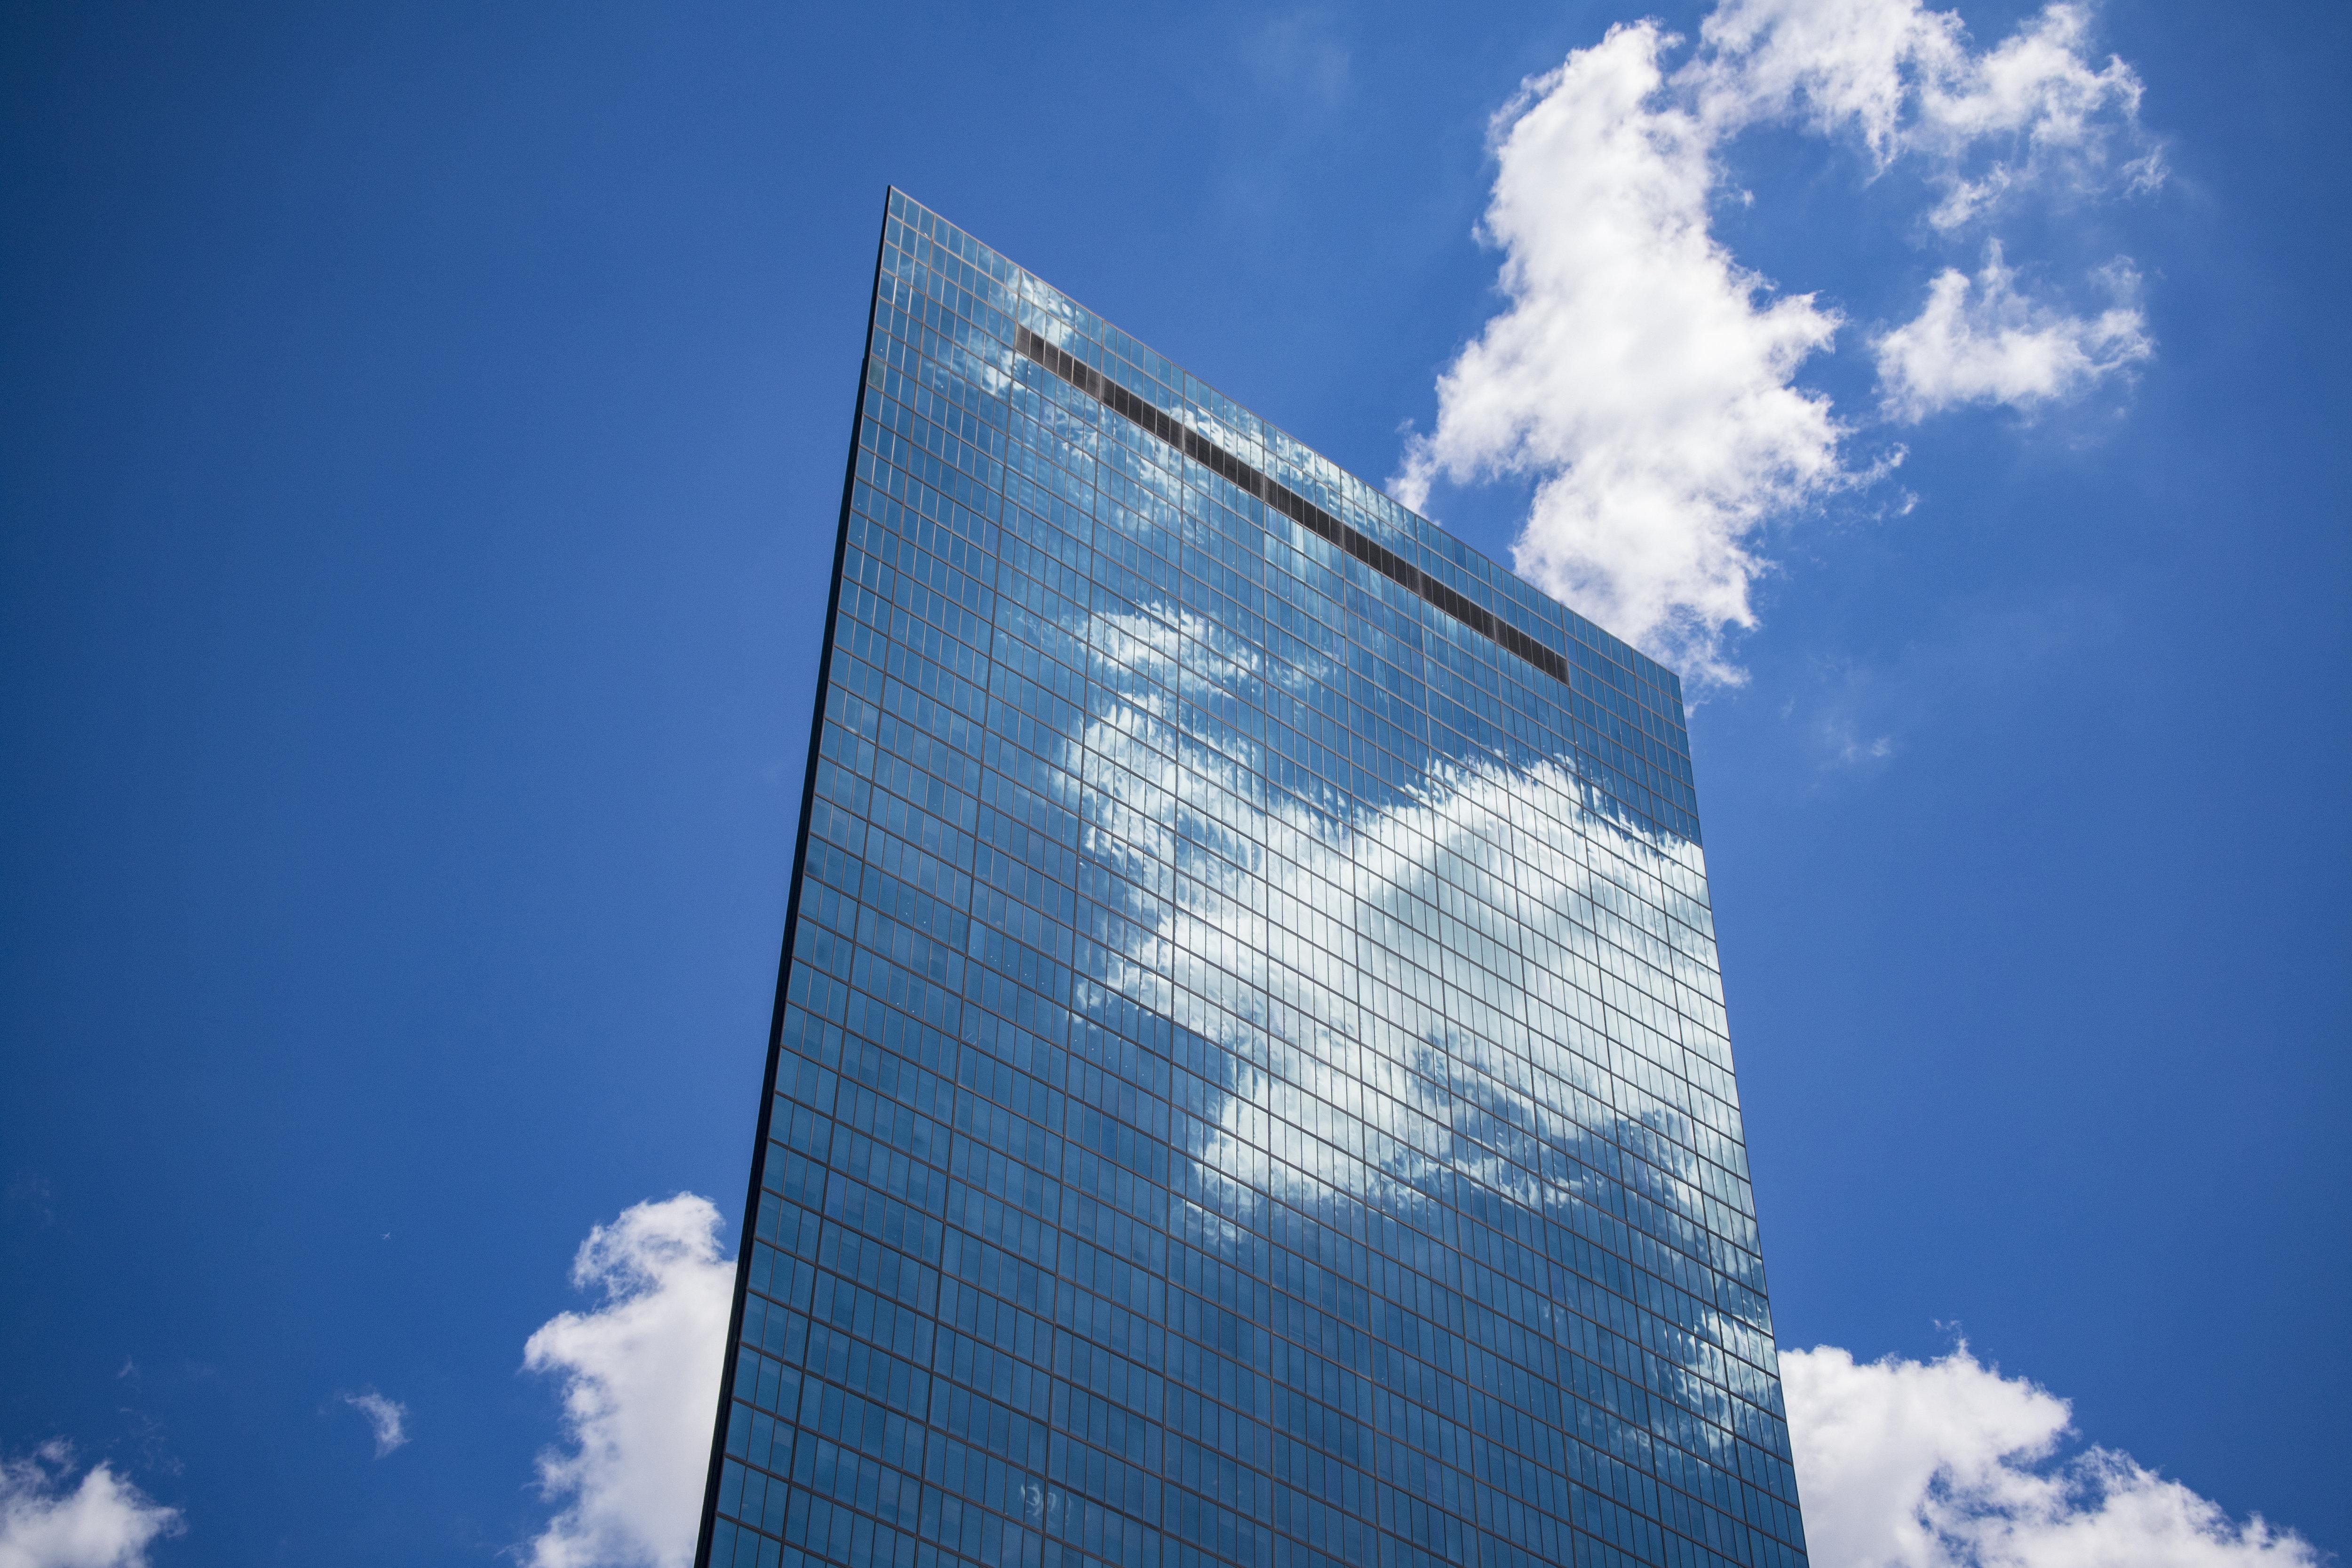 A sample image shot by the Nikon 1 J5.